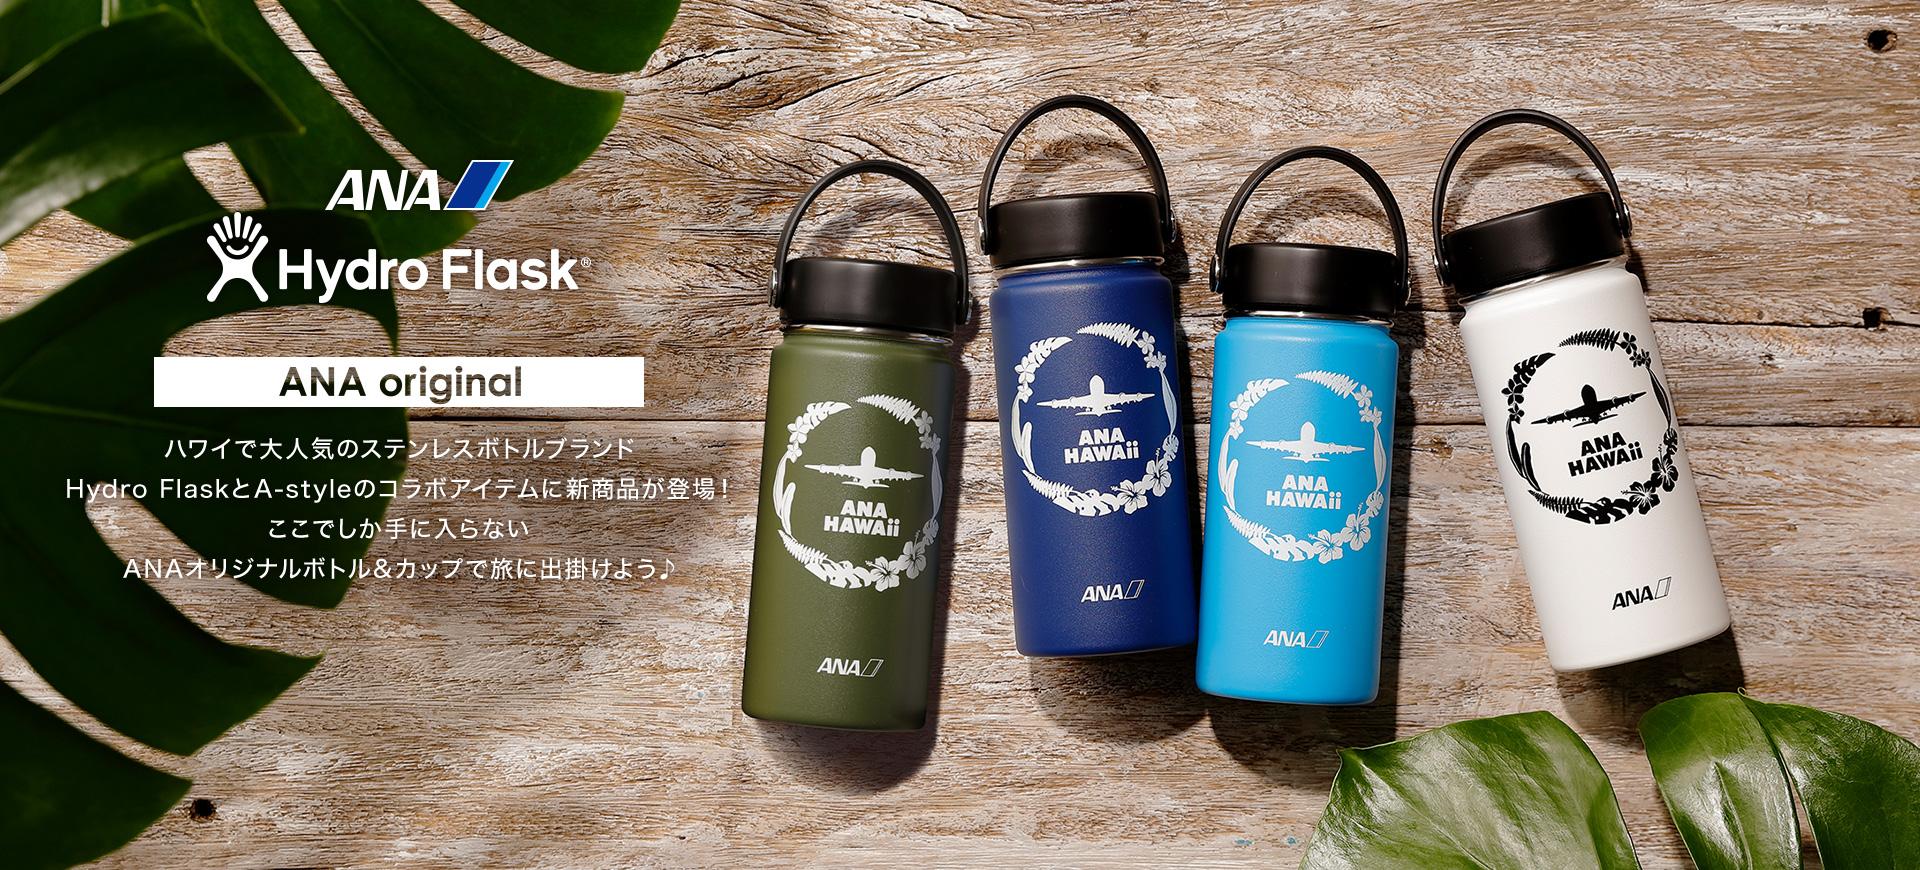 ANA Hydro Flask® ANA original ハワイで大人気のステンレスボトルブランドHydro FlaskとA-styleのコラボアイテムに新商品が登場!ここでしか手に入らないANAオリジナルボトル&カップで旅に出掛けよう♪